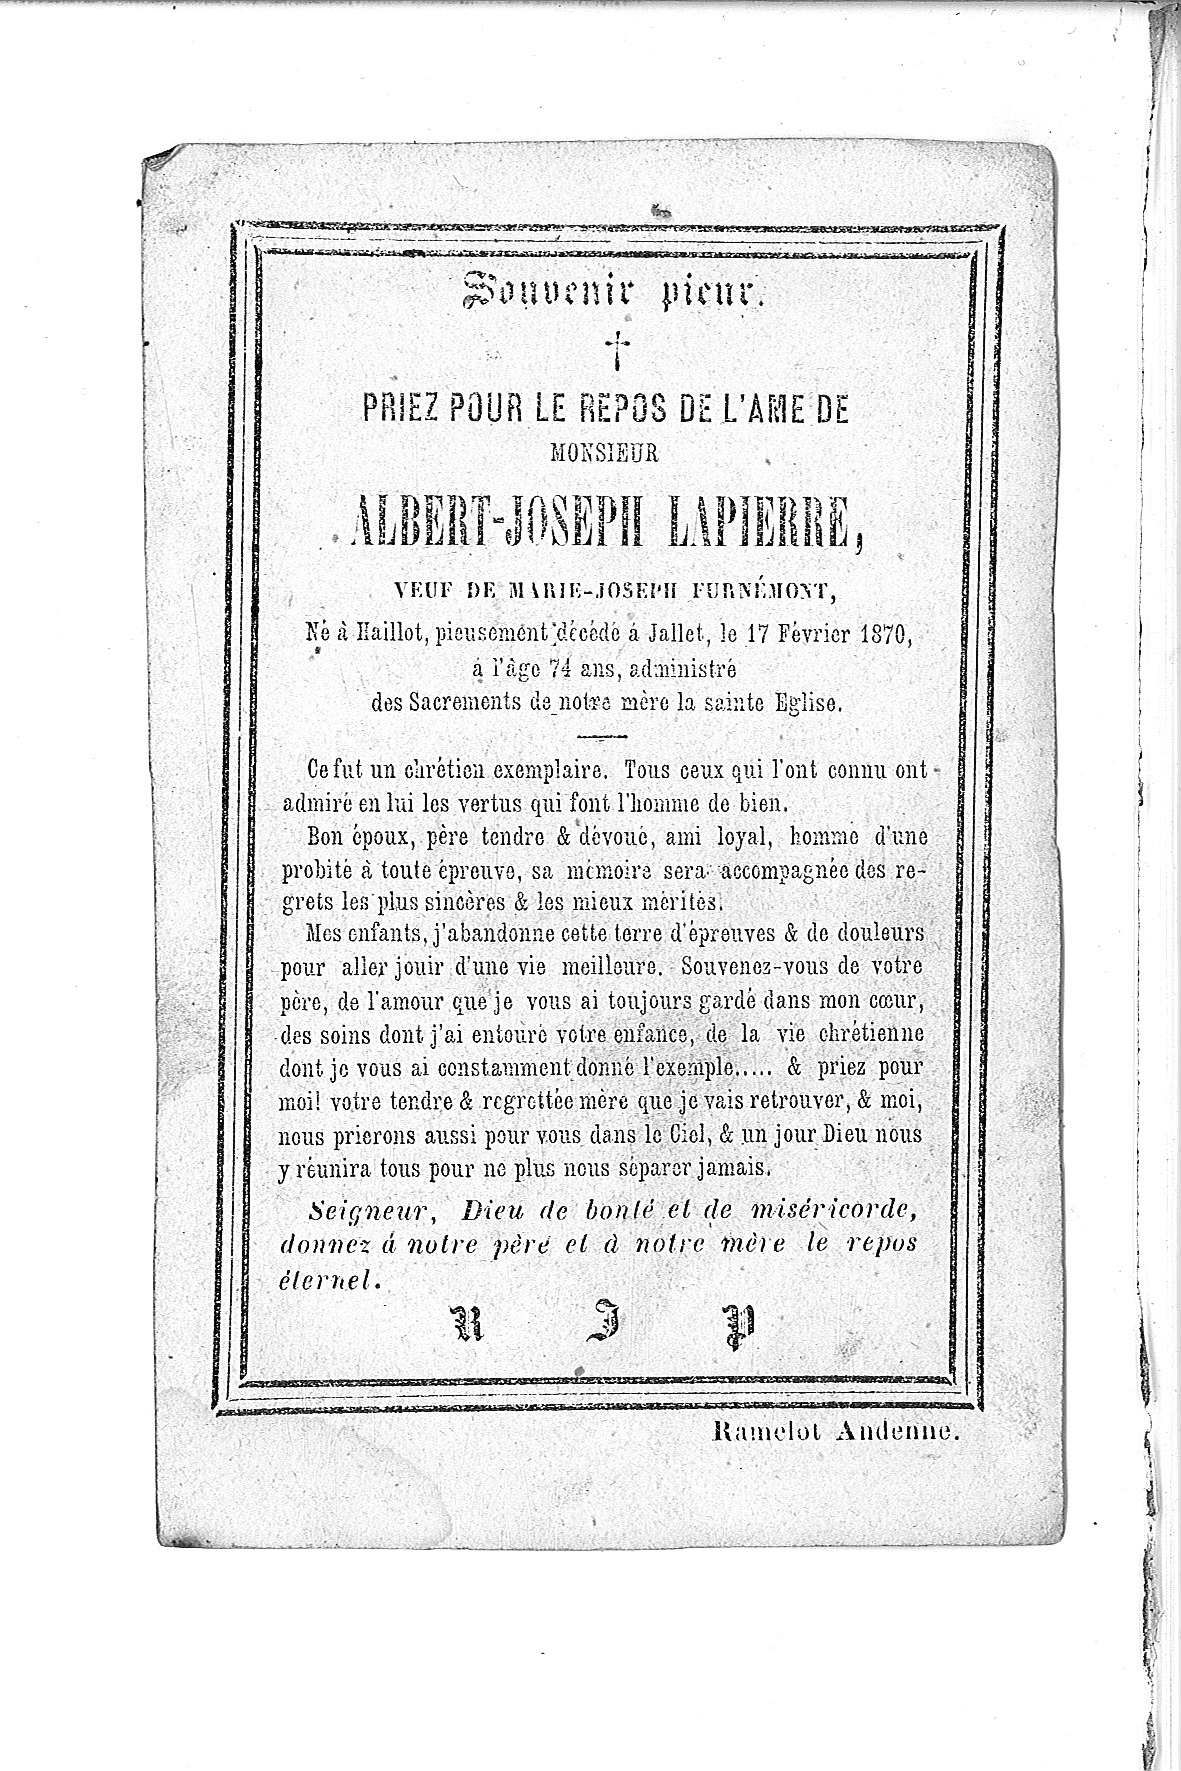 Albert-Joseph20110920151234_00021.jpg